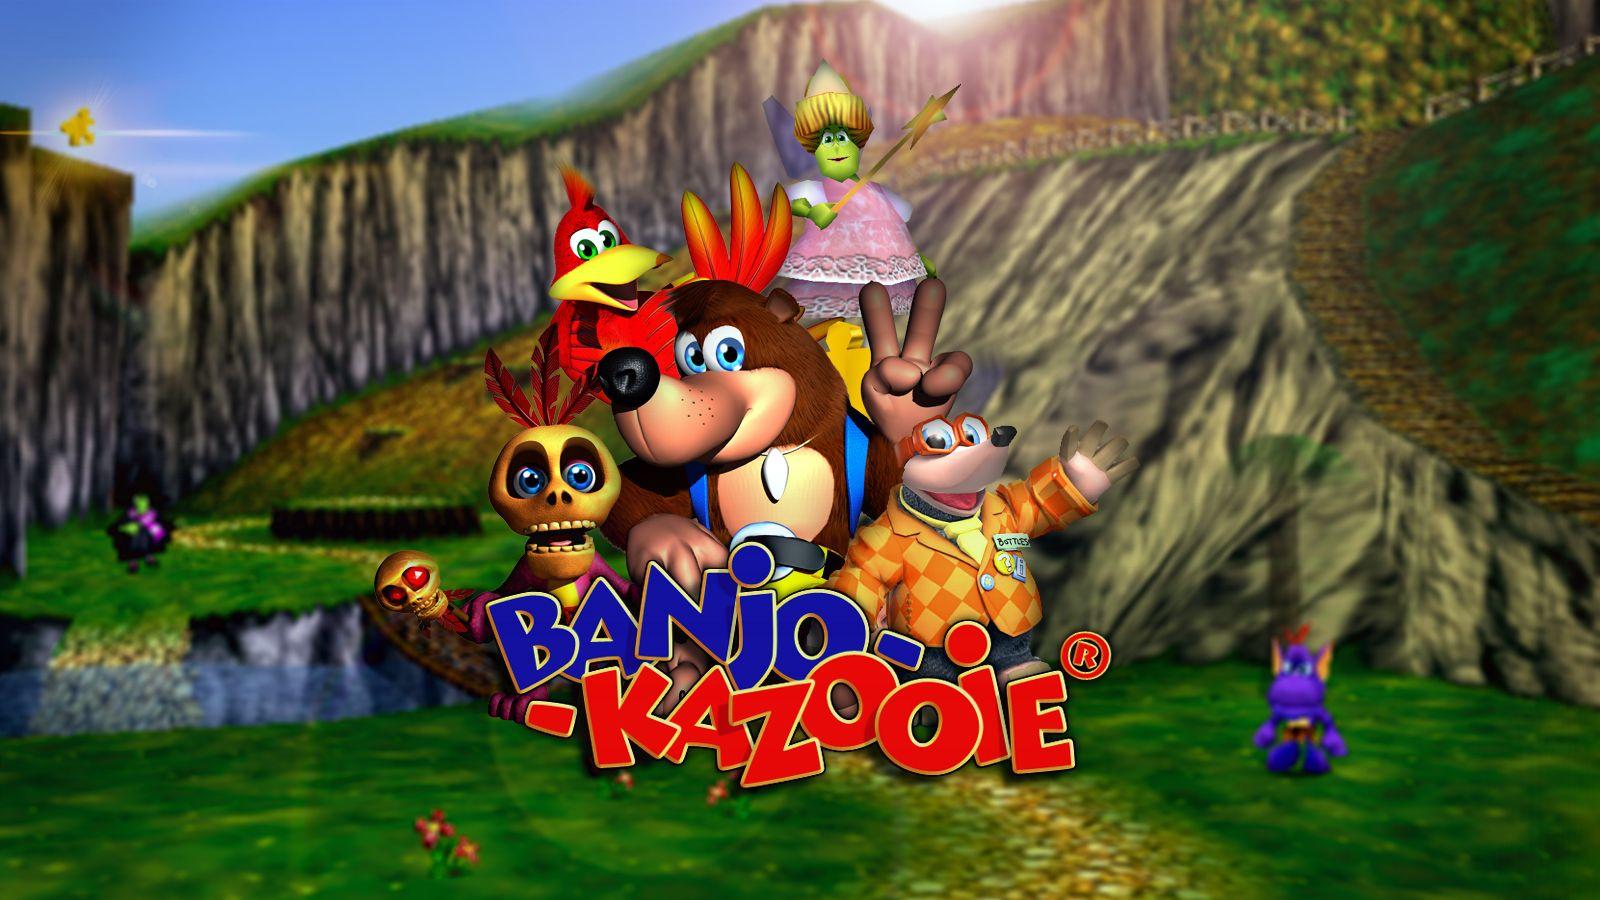 Banjo Kazooie Banjo Tooie Banjo Kazooie Super Smash Bros Banjo